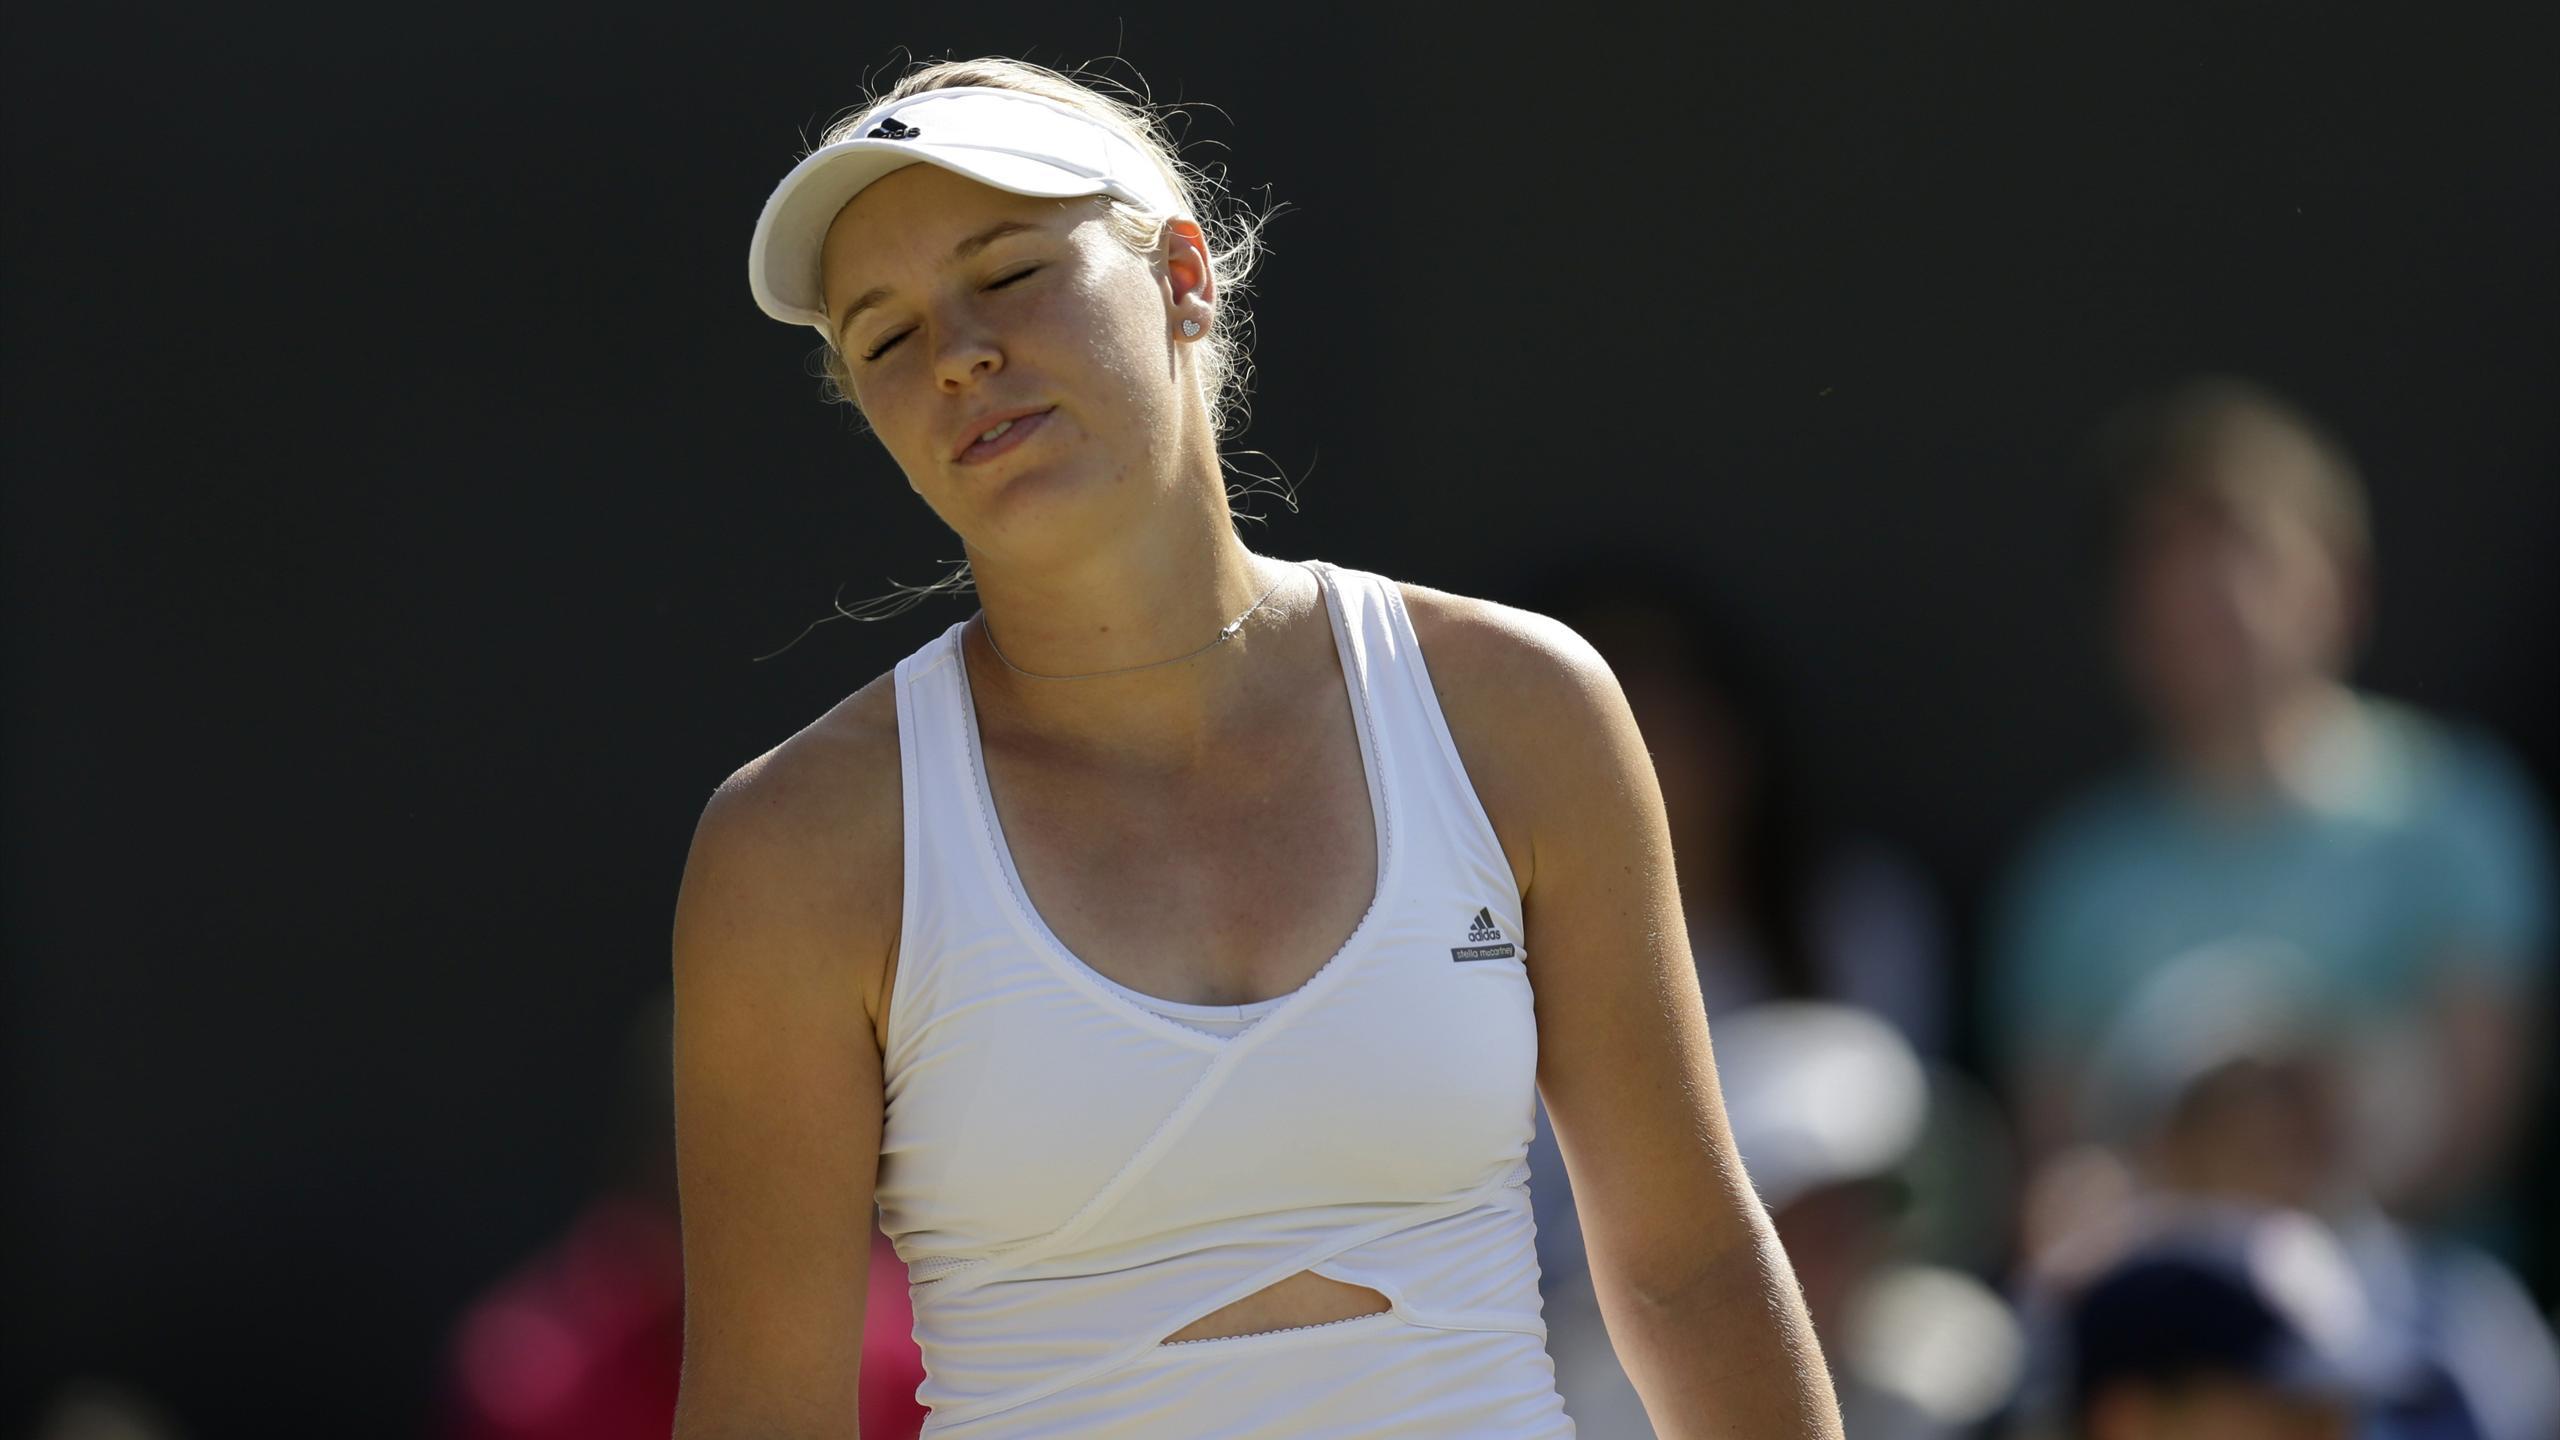 Caroline Wozniacki of Denmark reacts during her match against Garbine Muguruza of Spain at Wimbledon